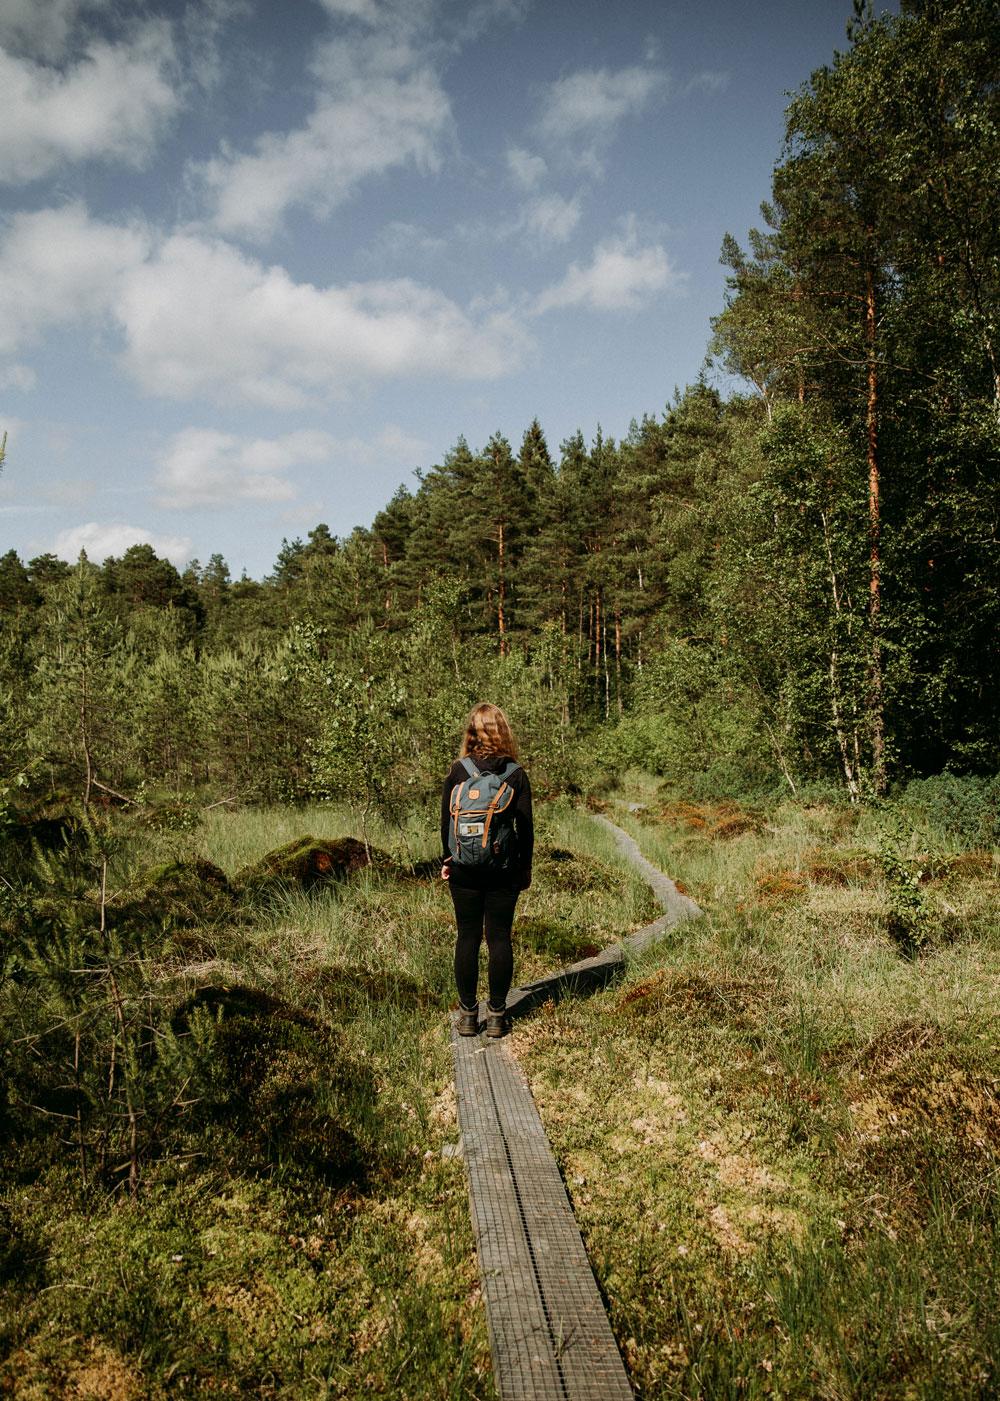 Vandring i Skåne: Naturområdet Hovdala